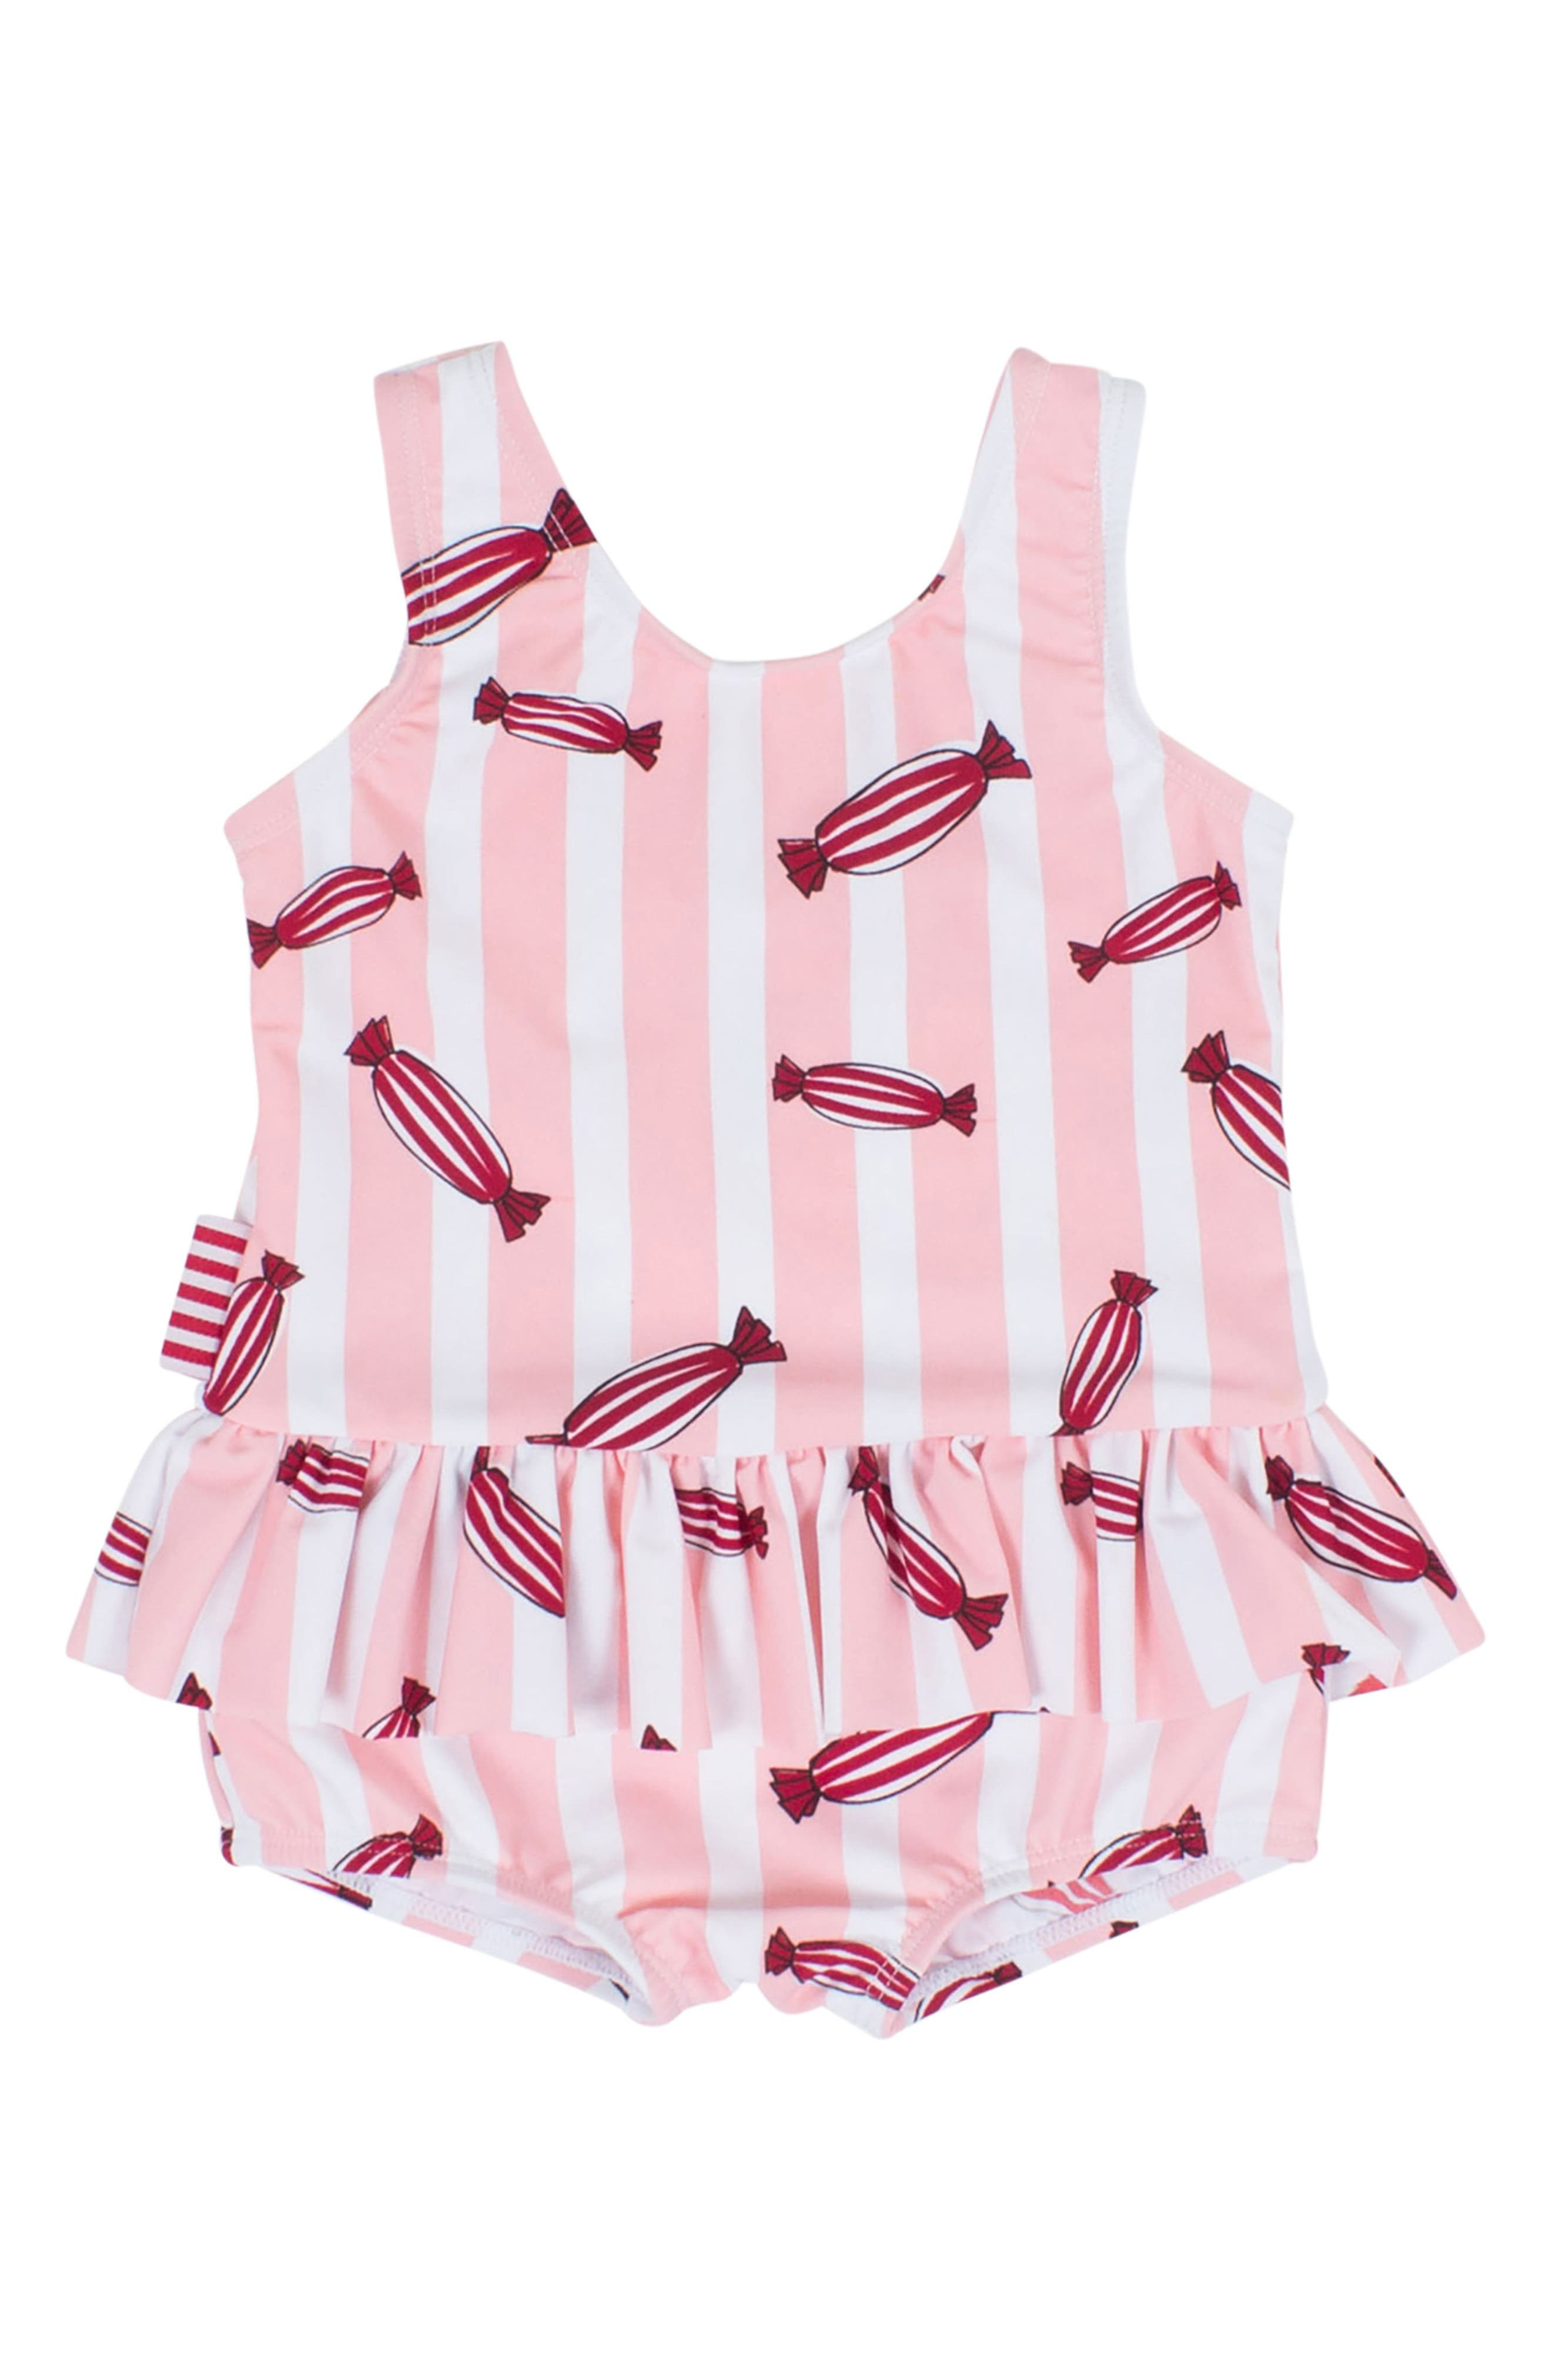 SOOKIbaby Bonbon Skirted One-Piece Swimsuit (Baby Girls & Toddler Girls)